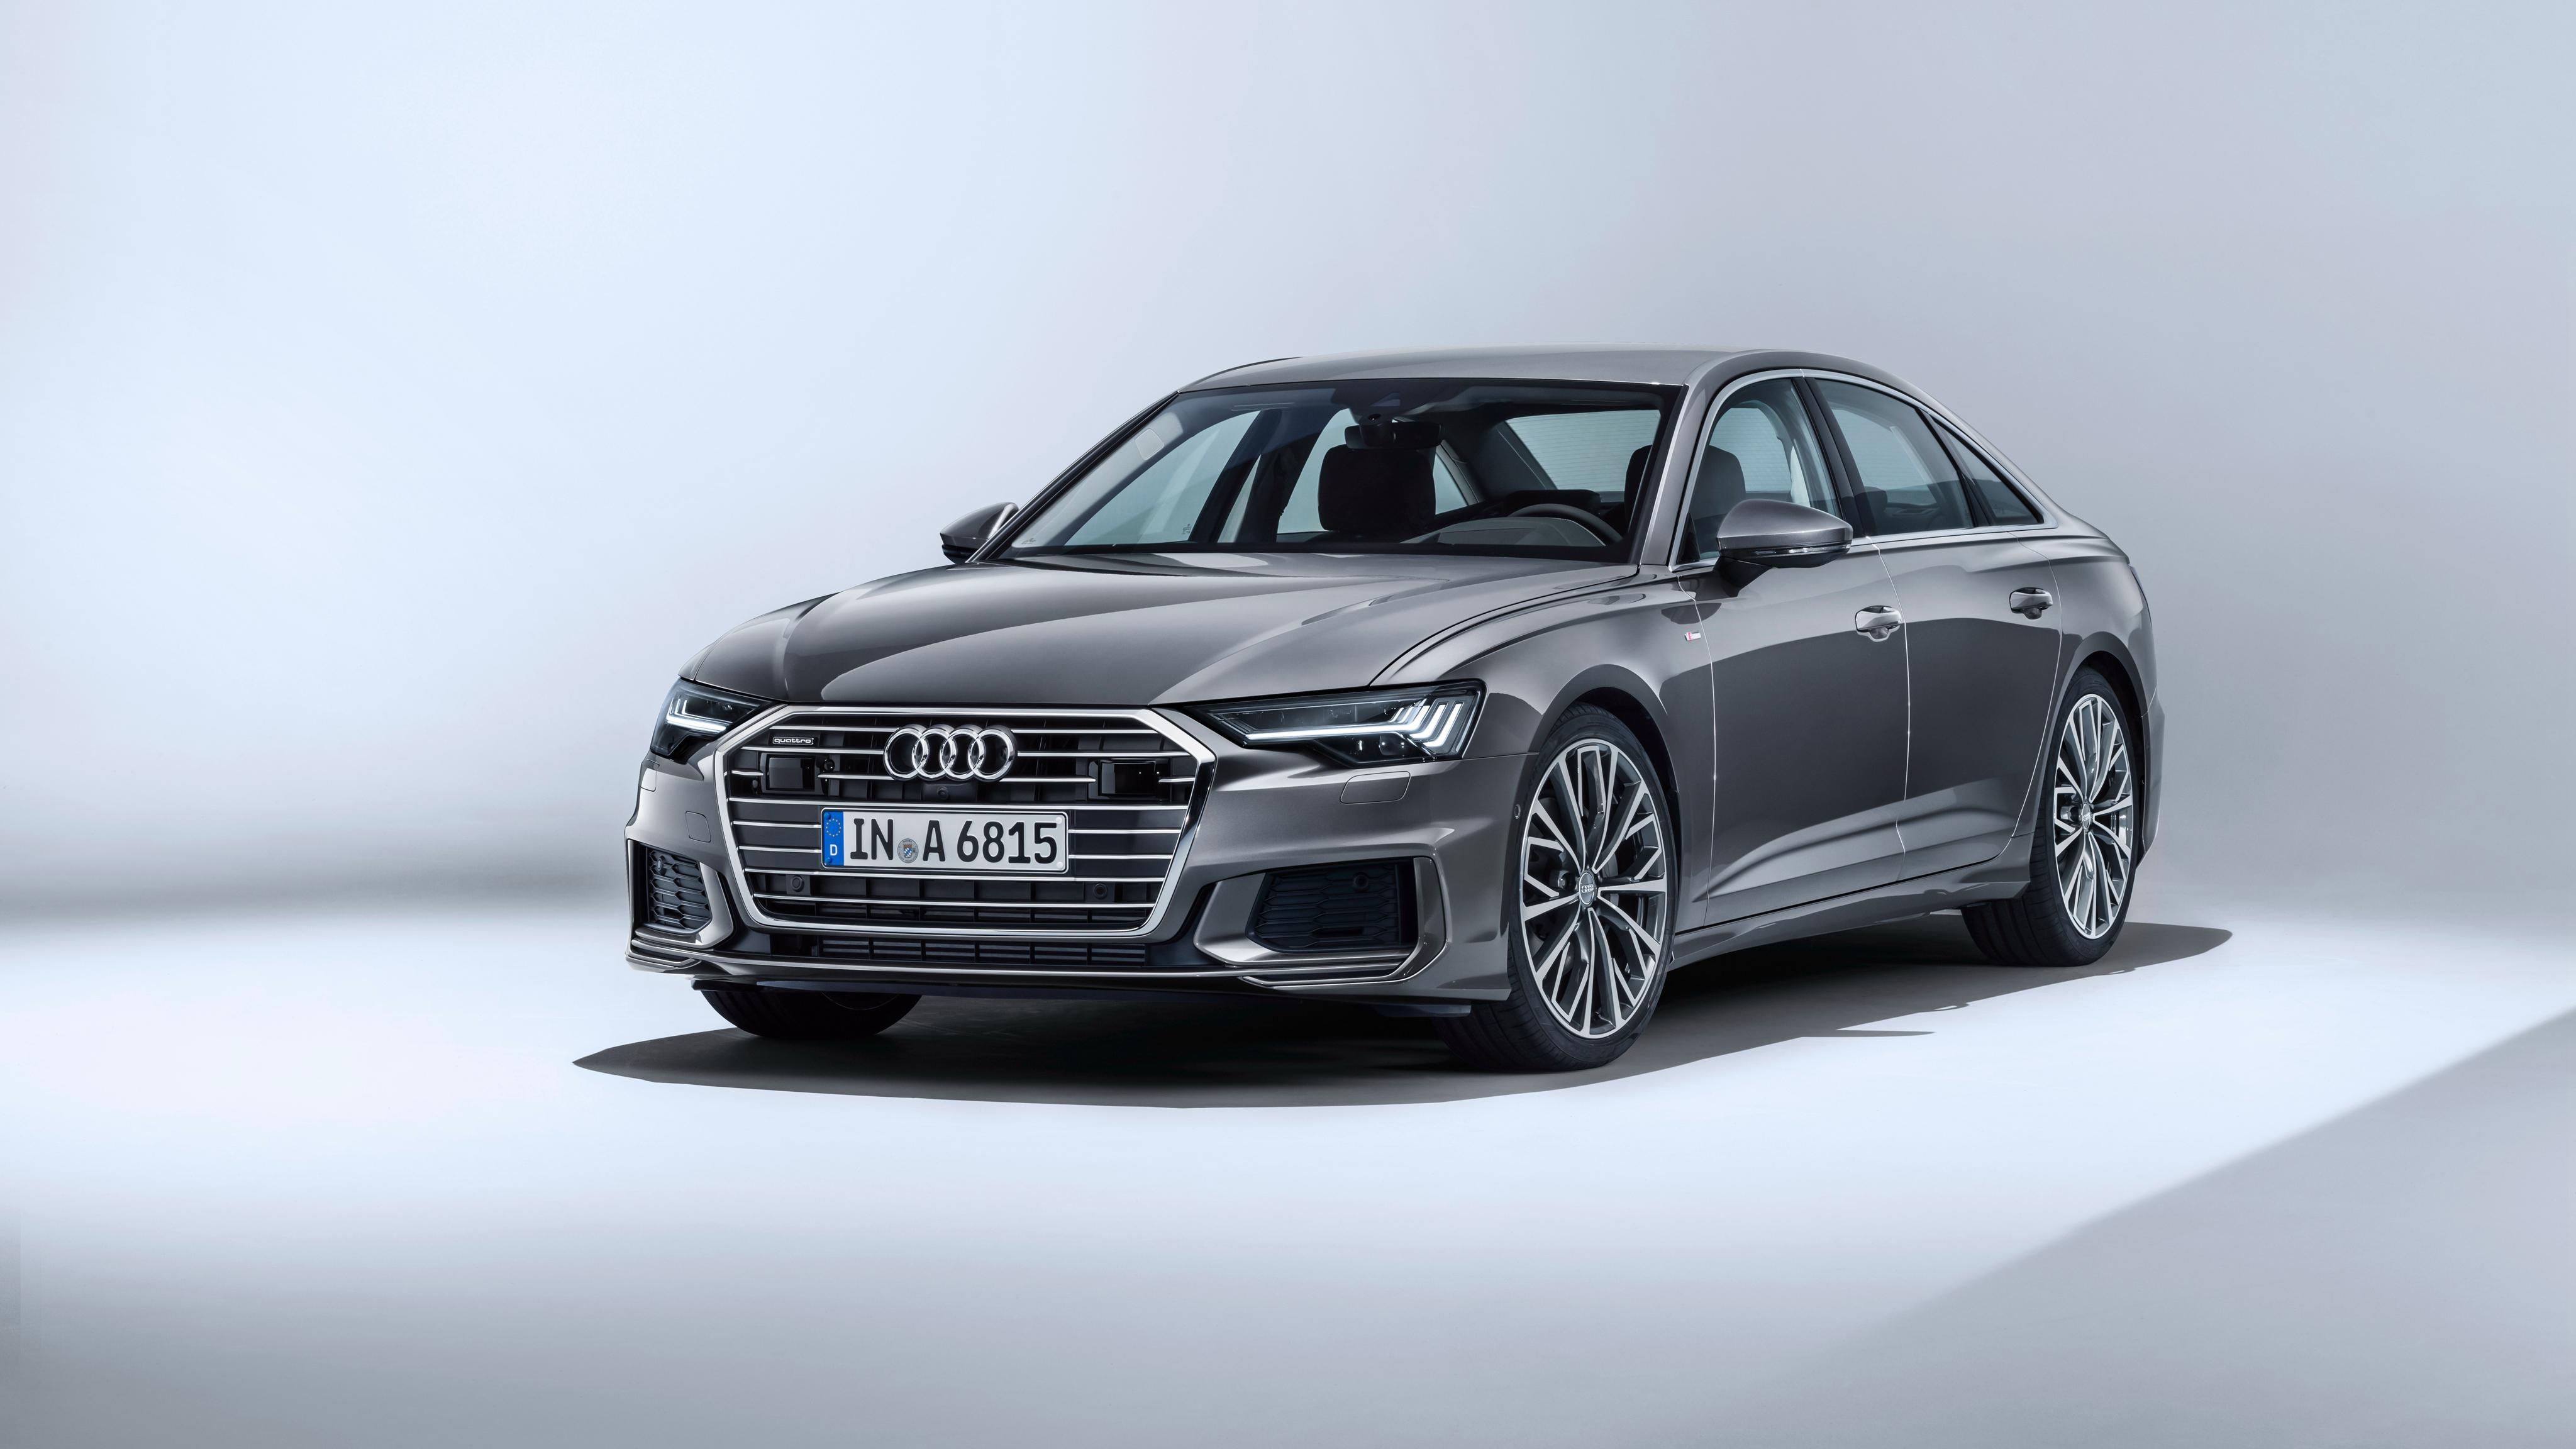 Razor 3d Wallpaper Audi A6 50 Tdi Quattro S Line 2018 4k Wallpapers Hd